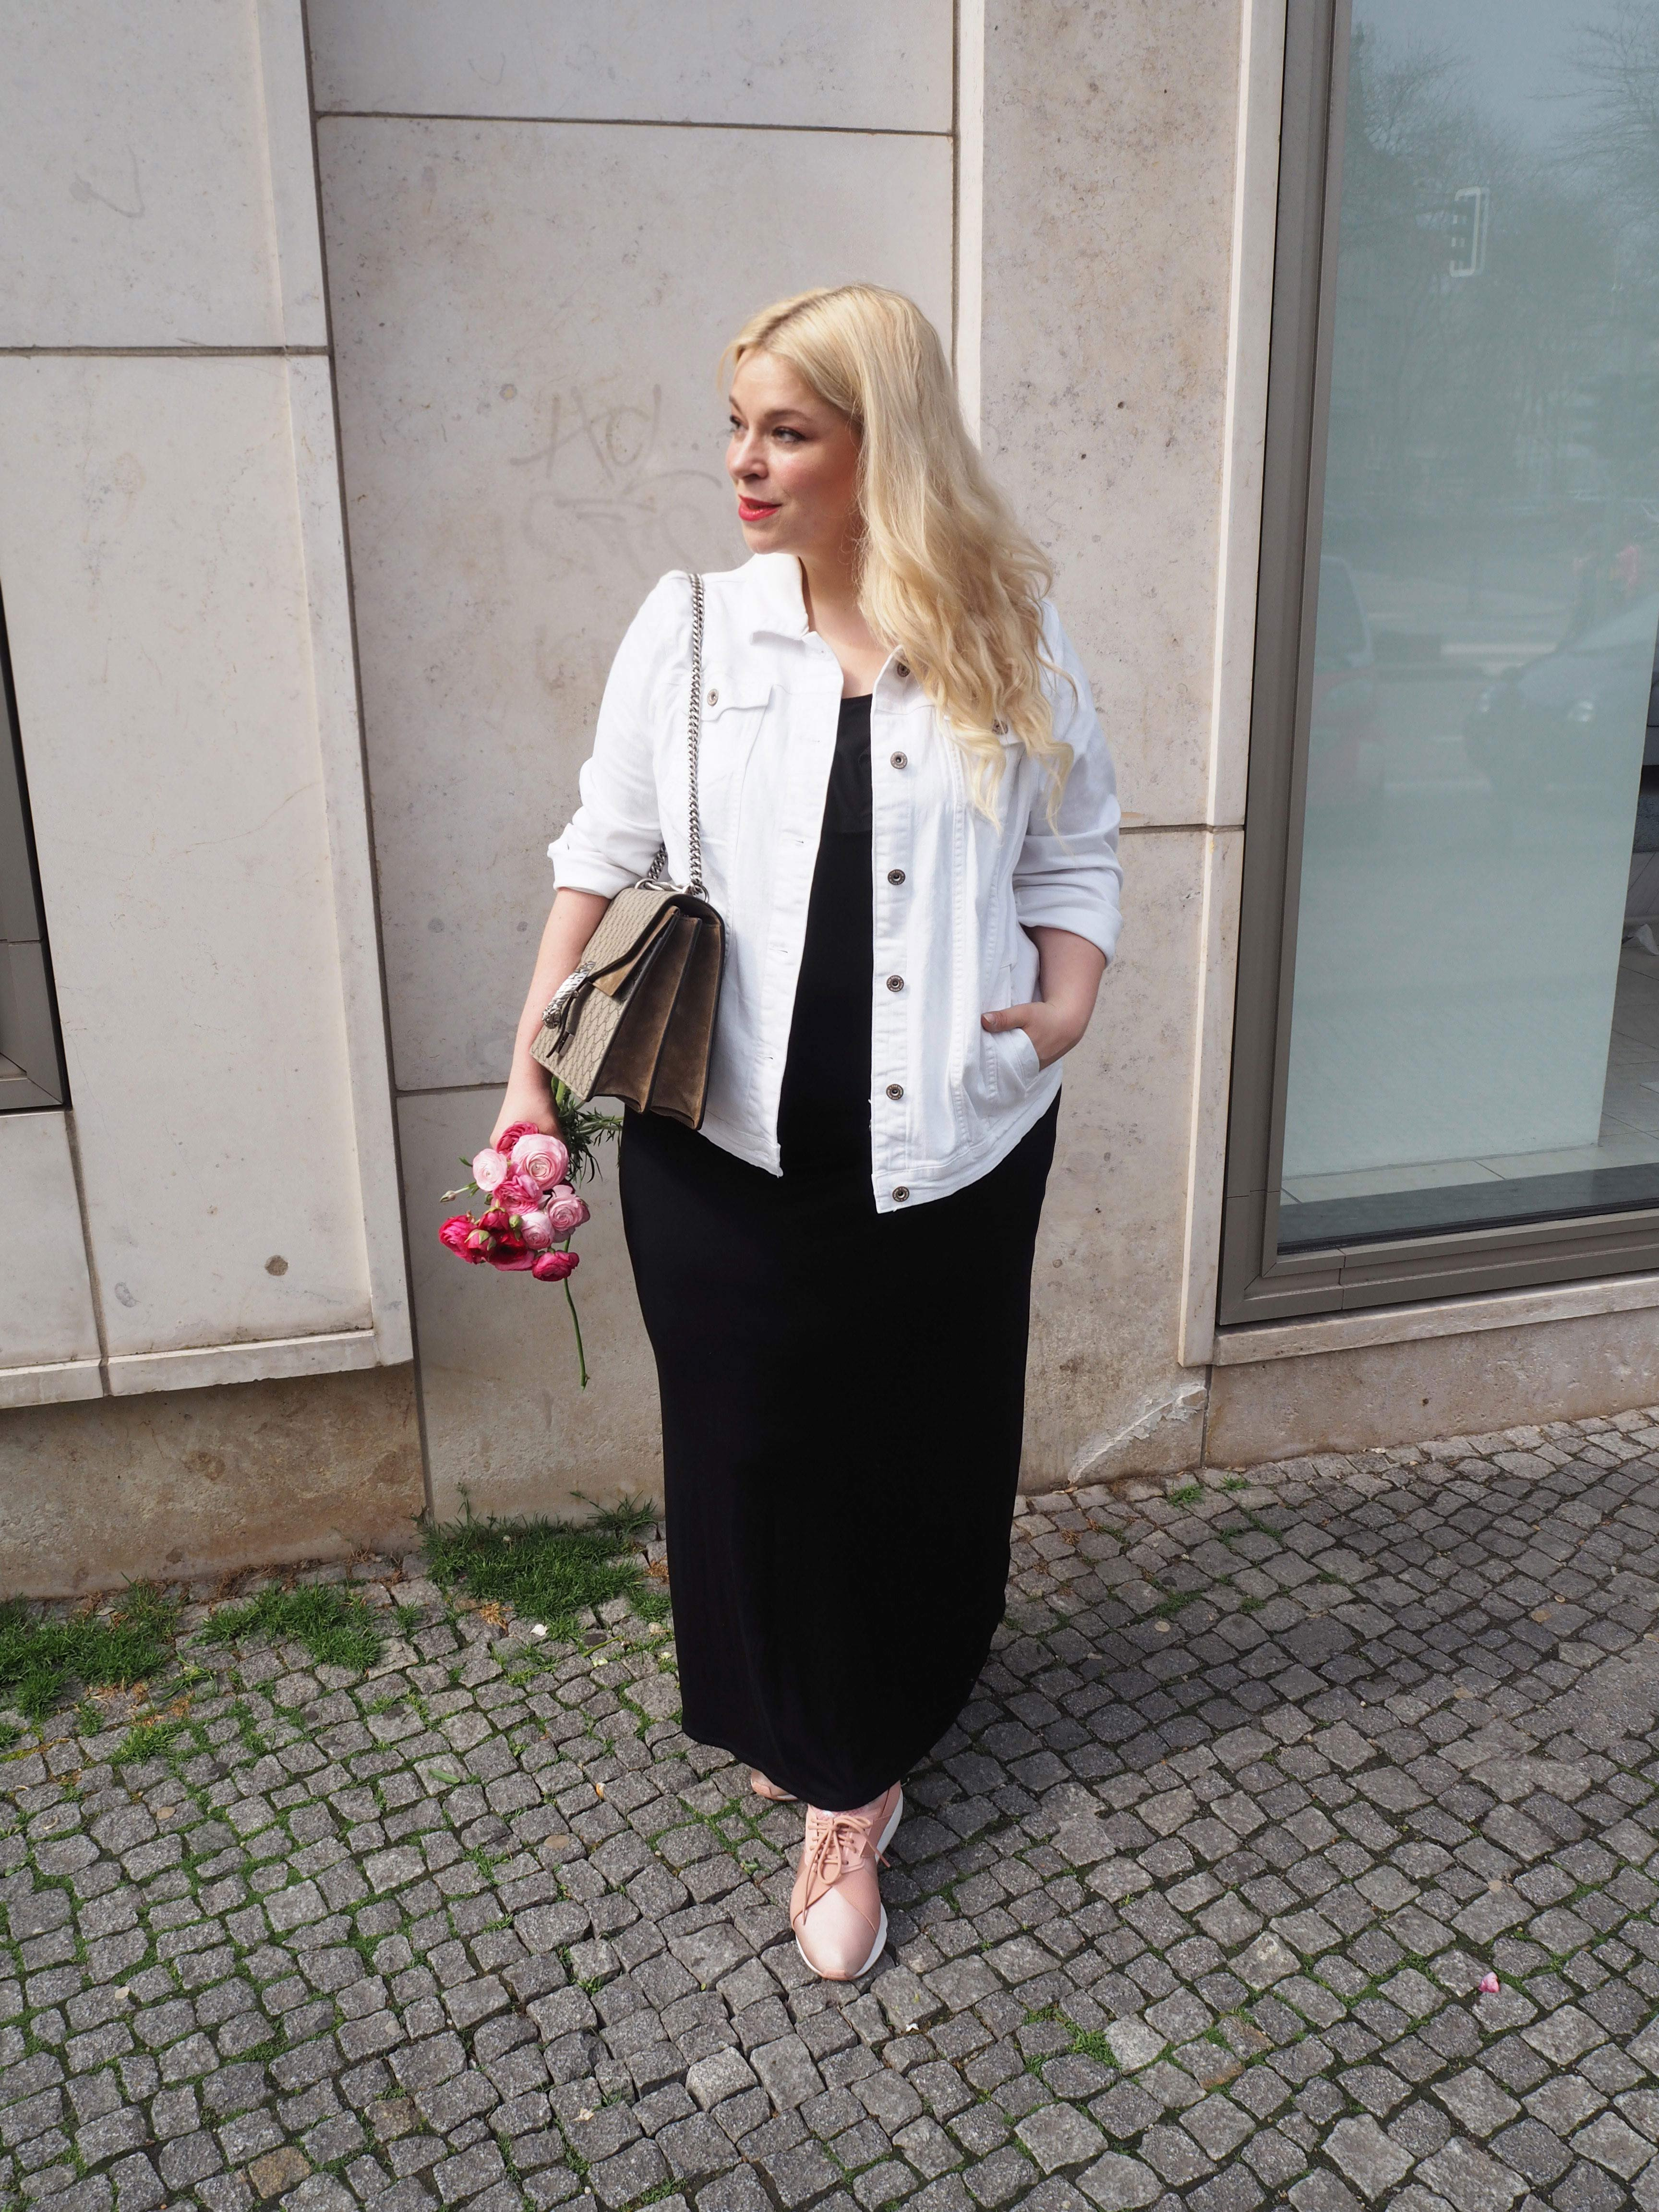 Plus-Size-Mode-Caterina-pogorzelski-Megabambi-plussize